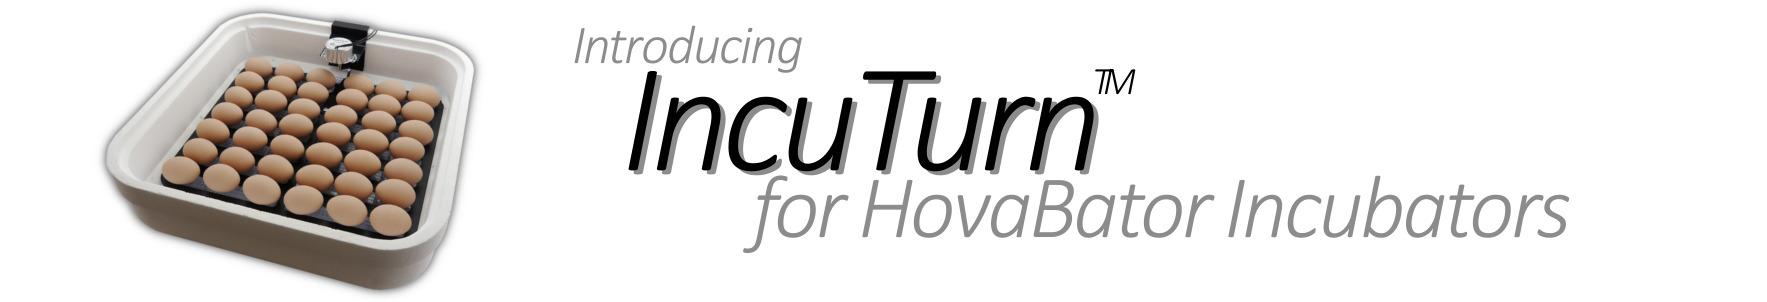 Introducing the IncuTurn